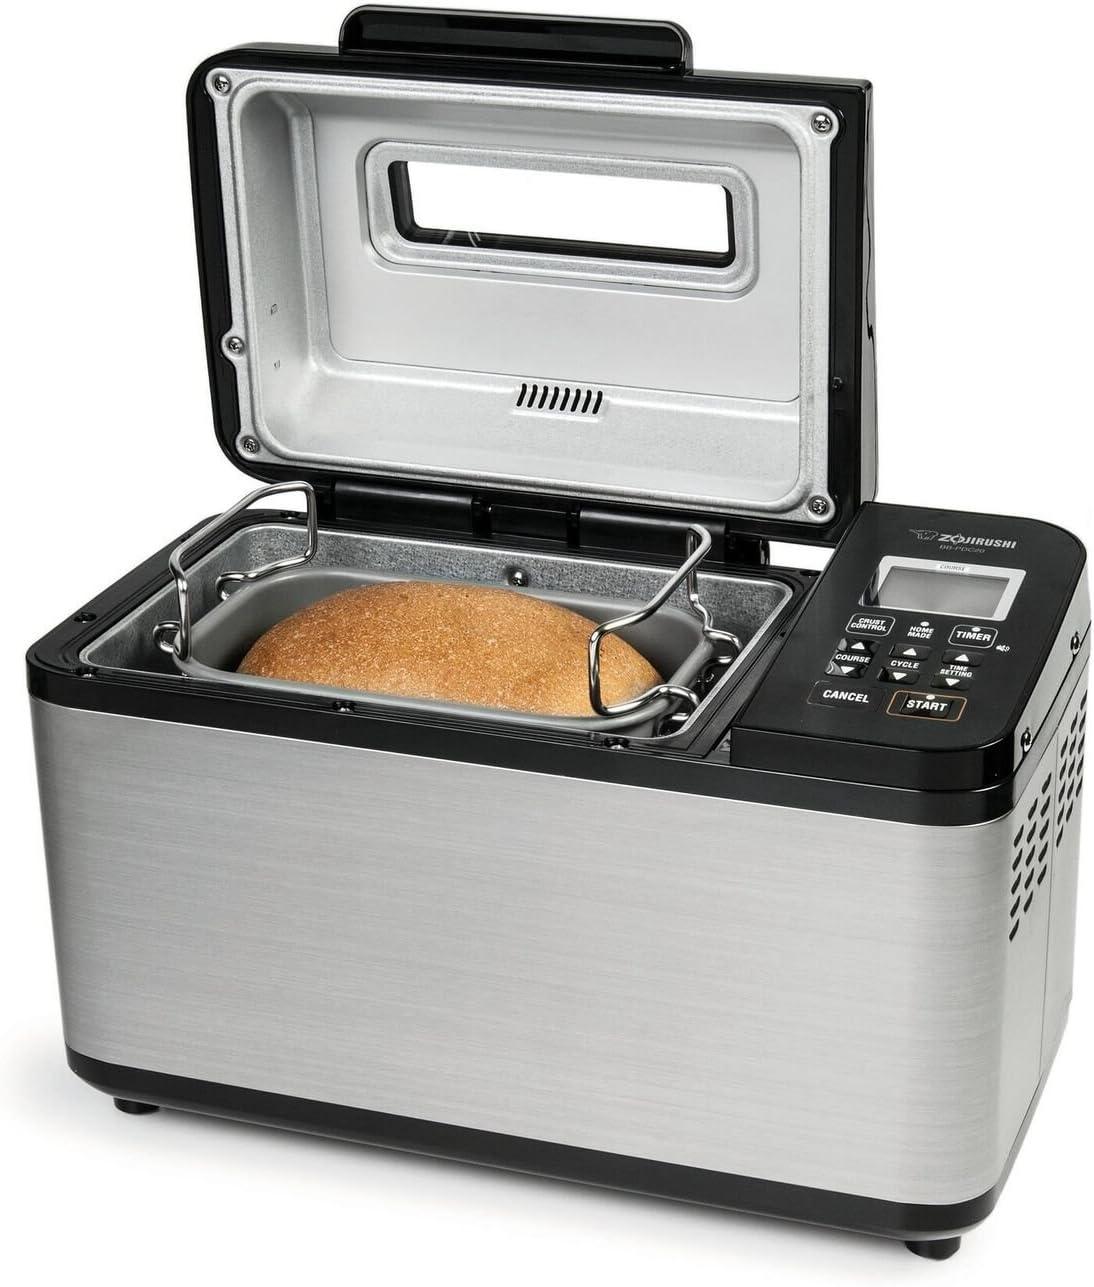 Zojirushi Home Bakery Virtuoso Plus Breadmaker - Amazon bread machines